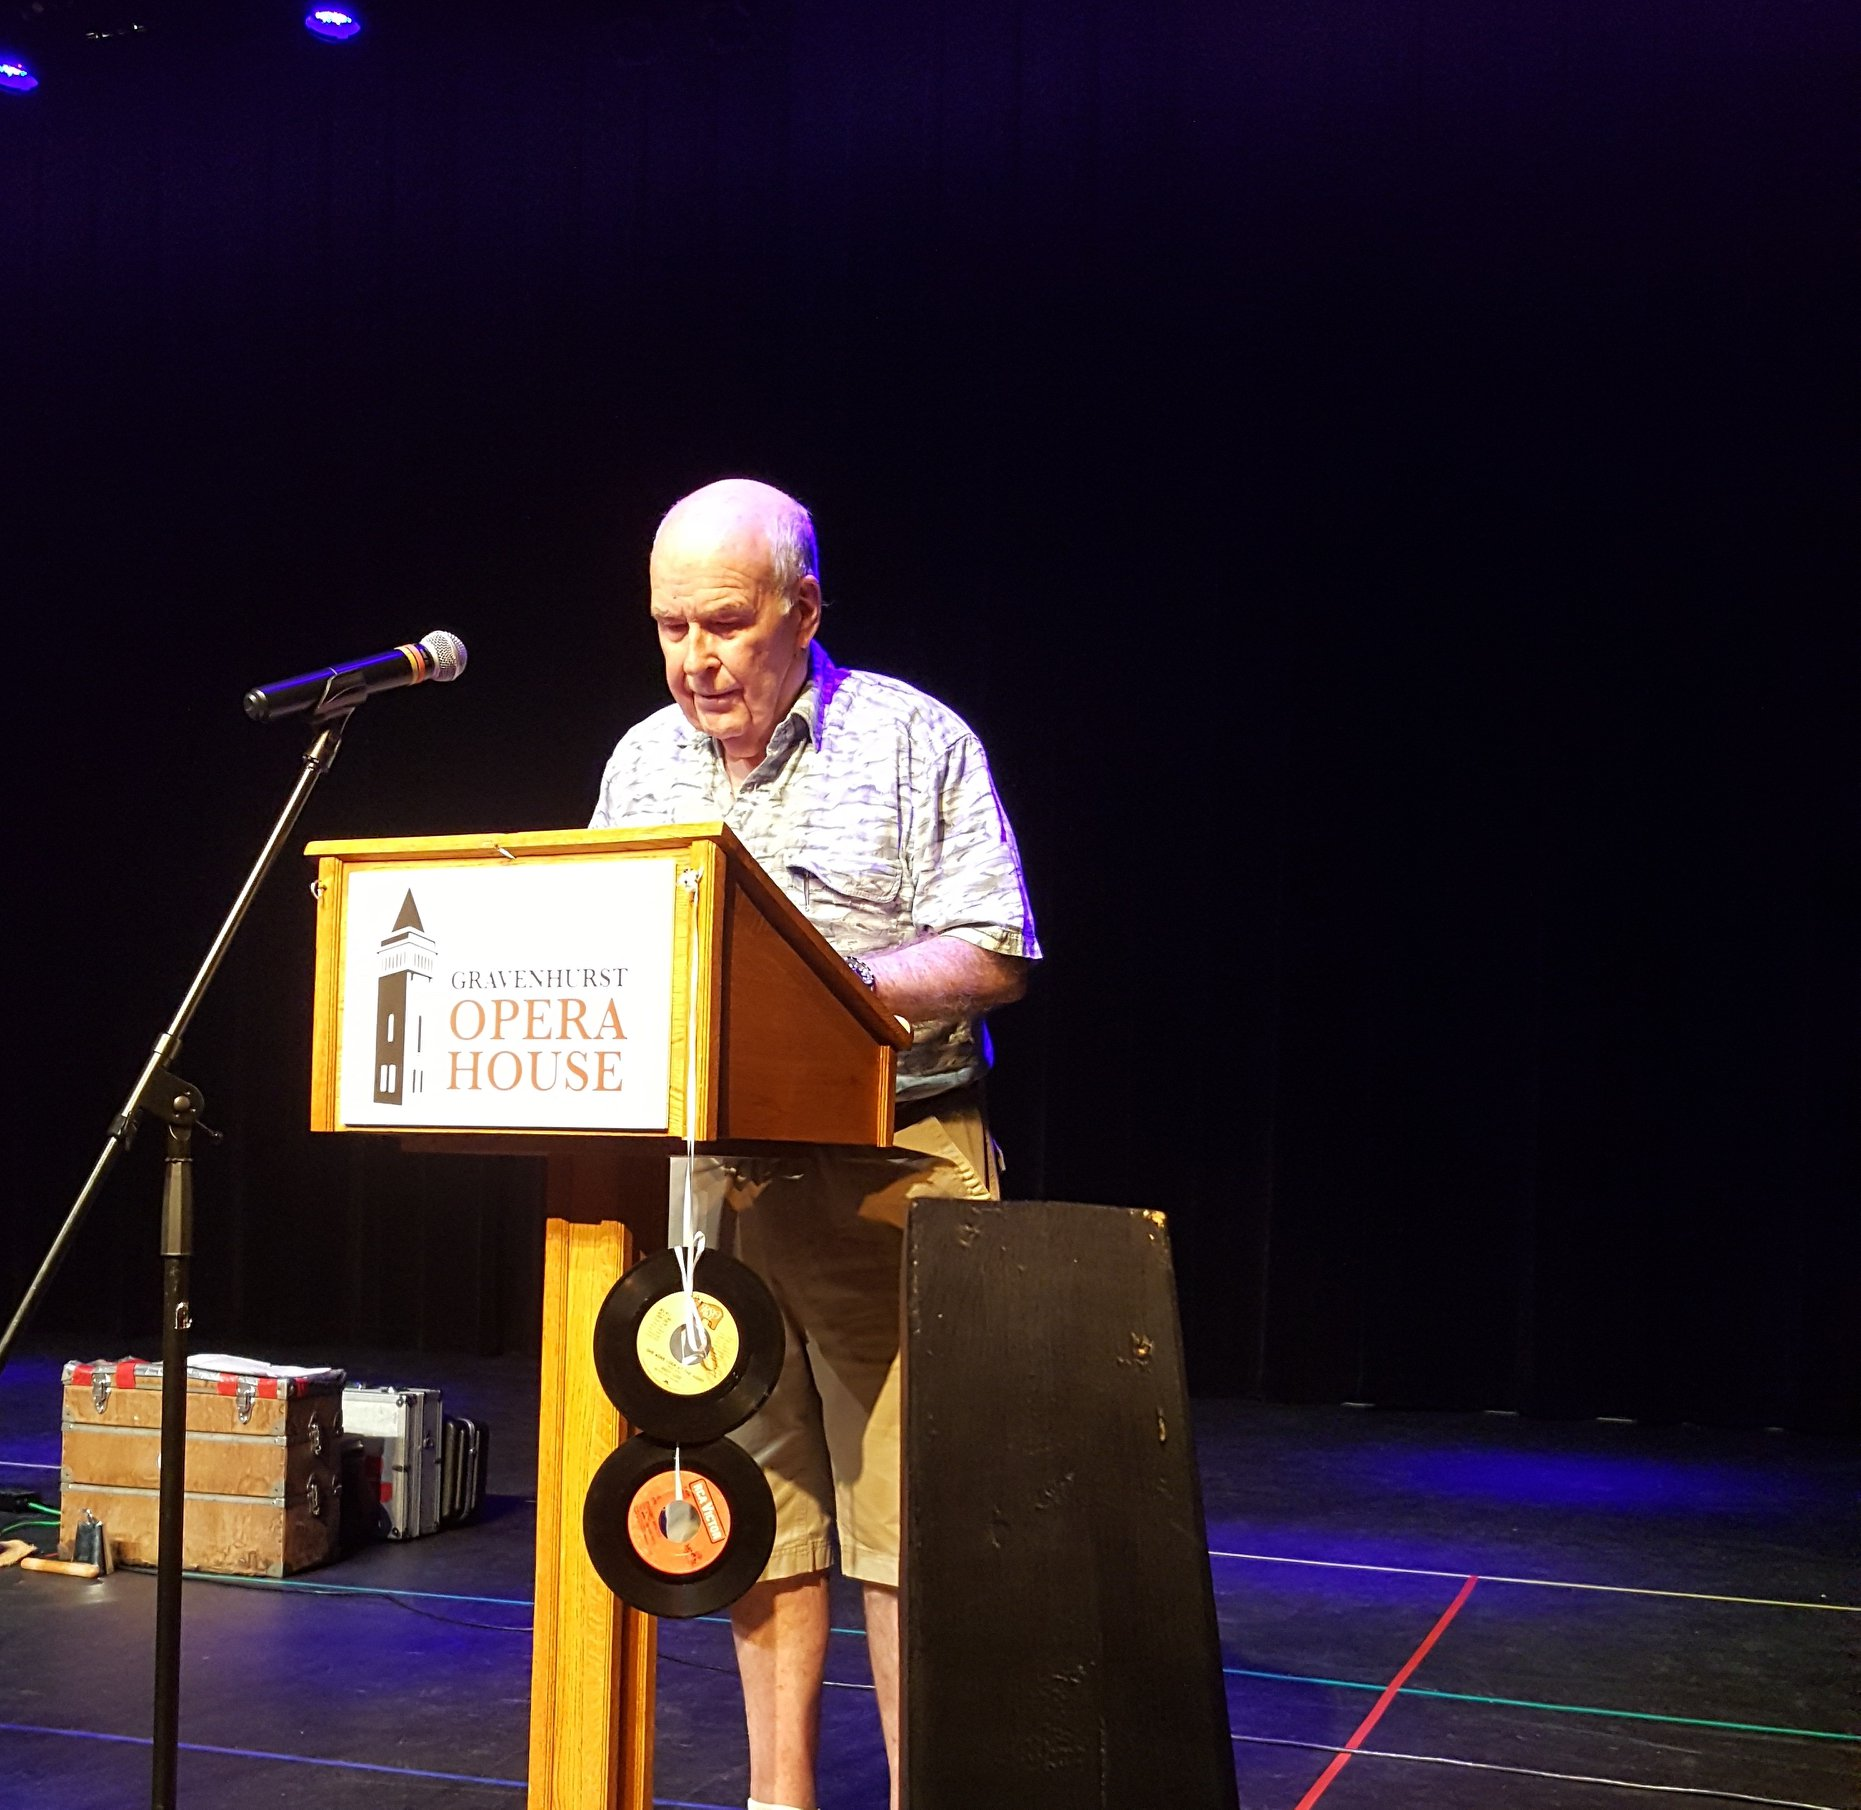 John Cooper giving his thank you speech.